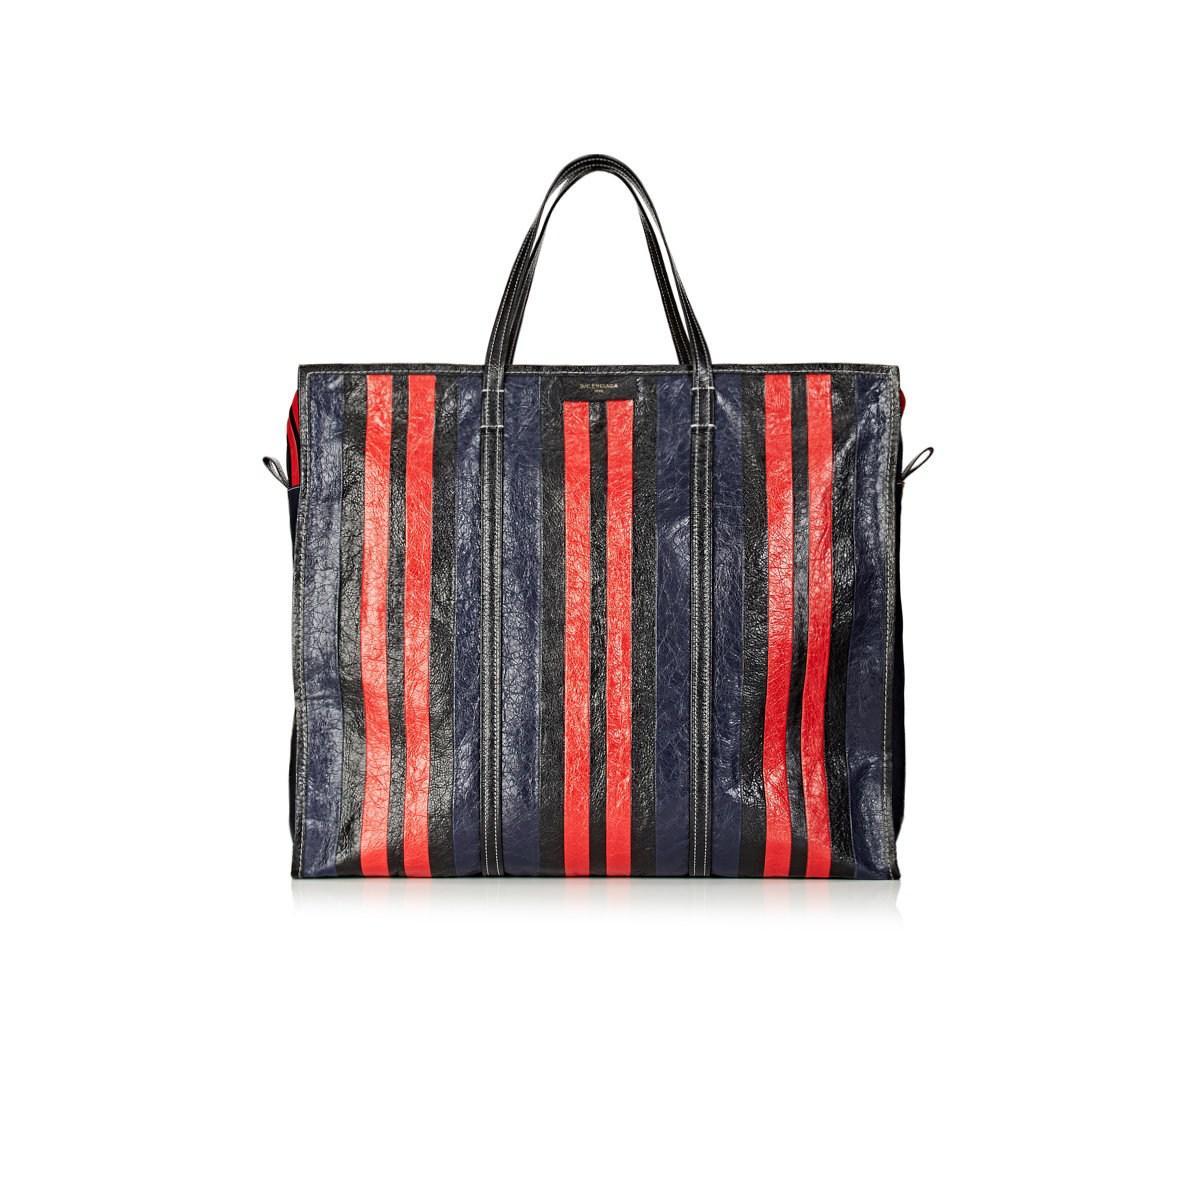 7c2e771dde3 Balenciaga Bazar Arena Leather Extra-large Shopper Tote Bag in Red ...